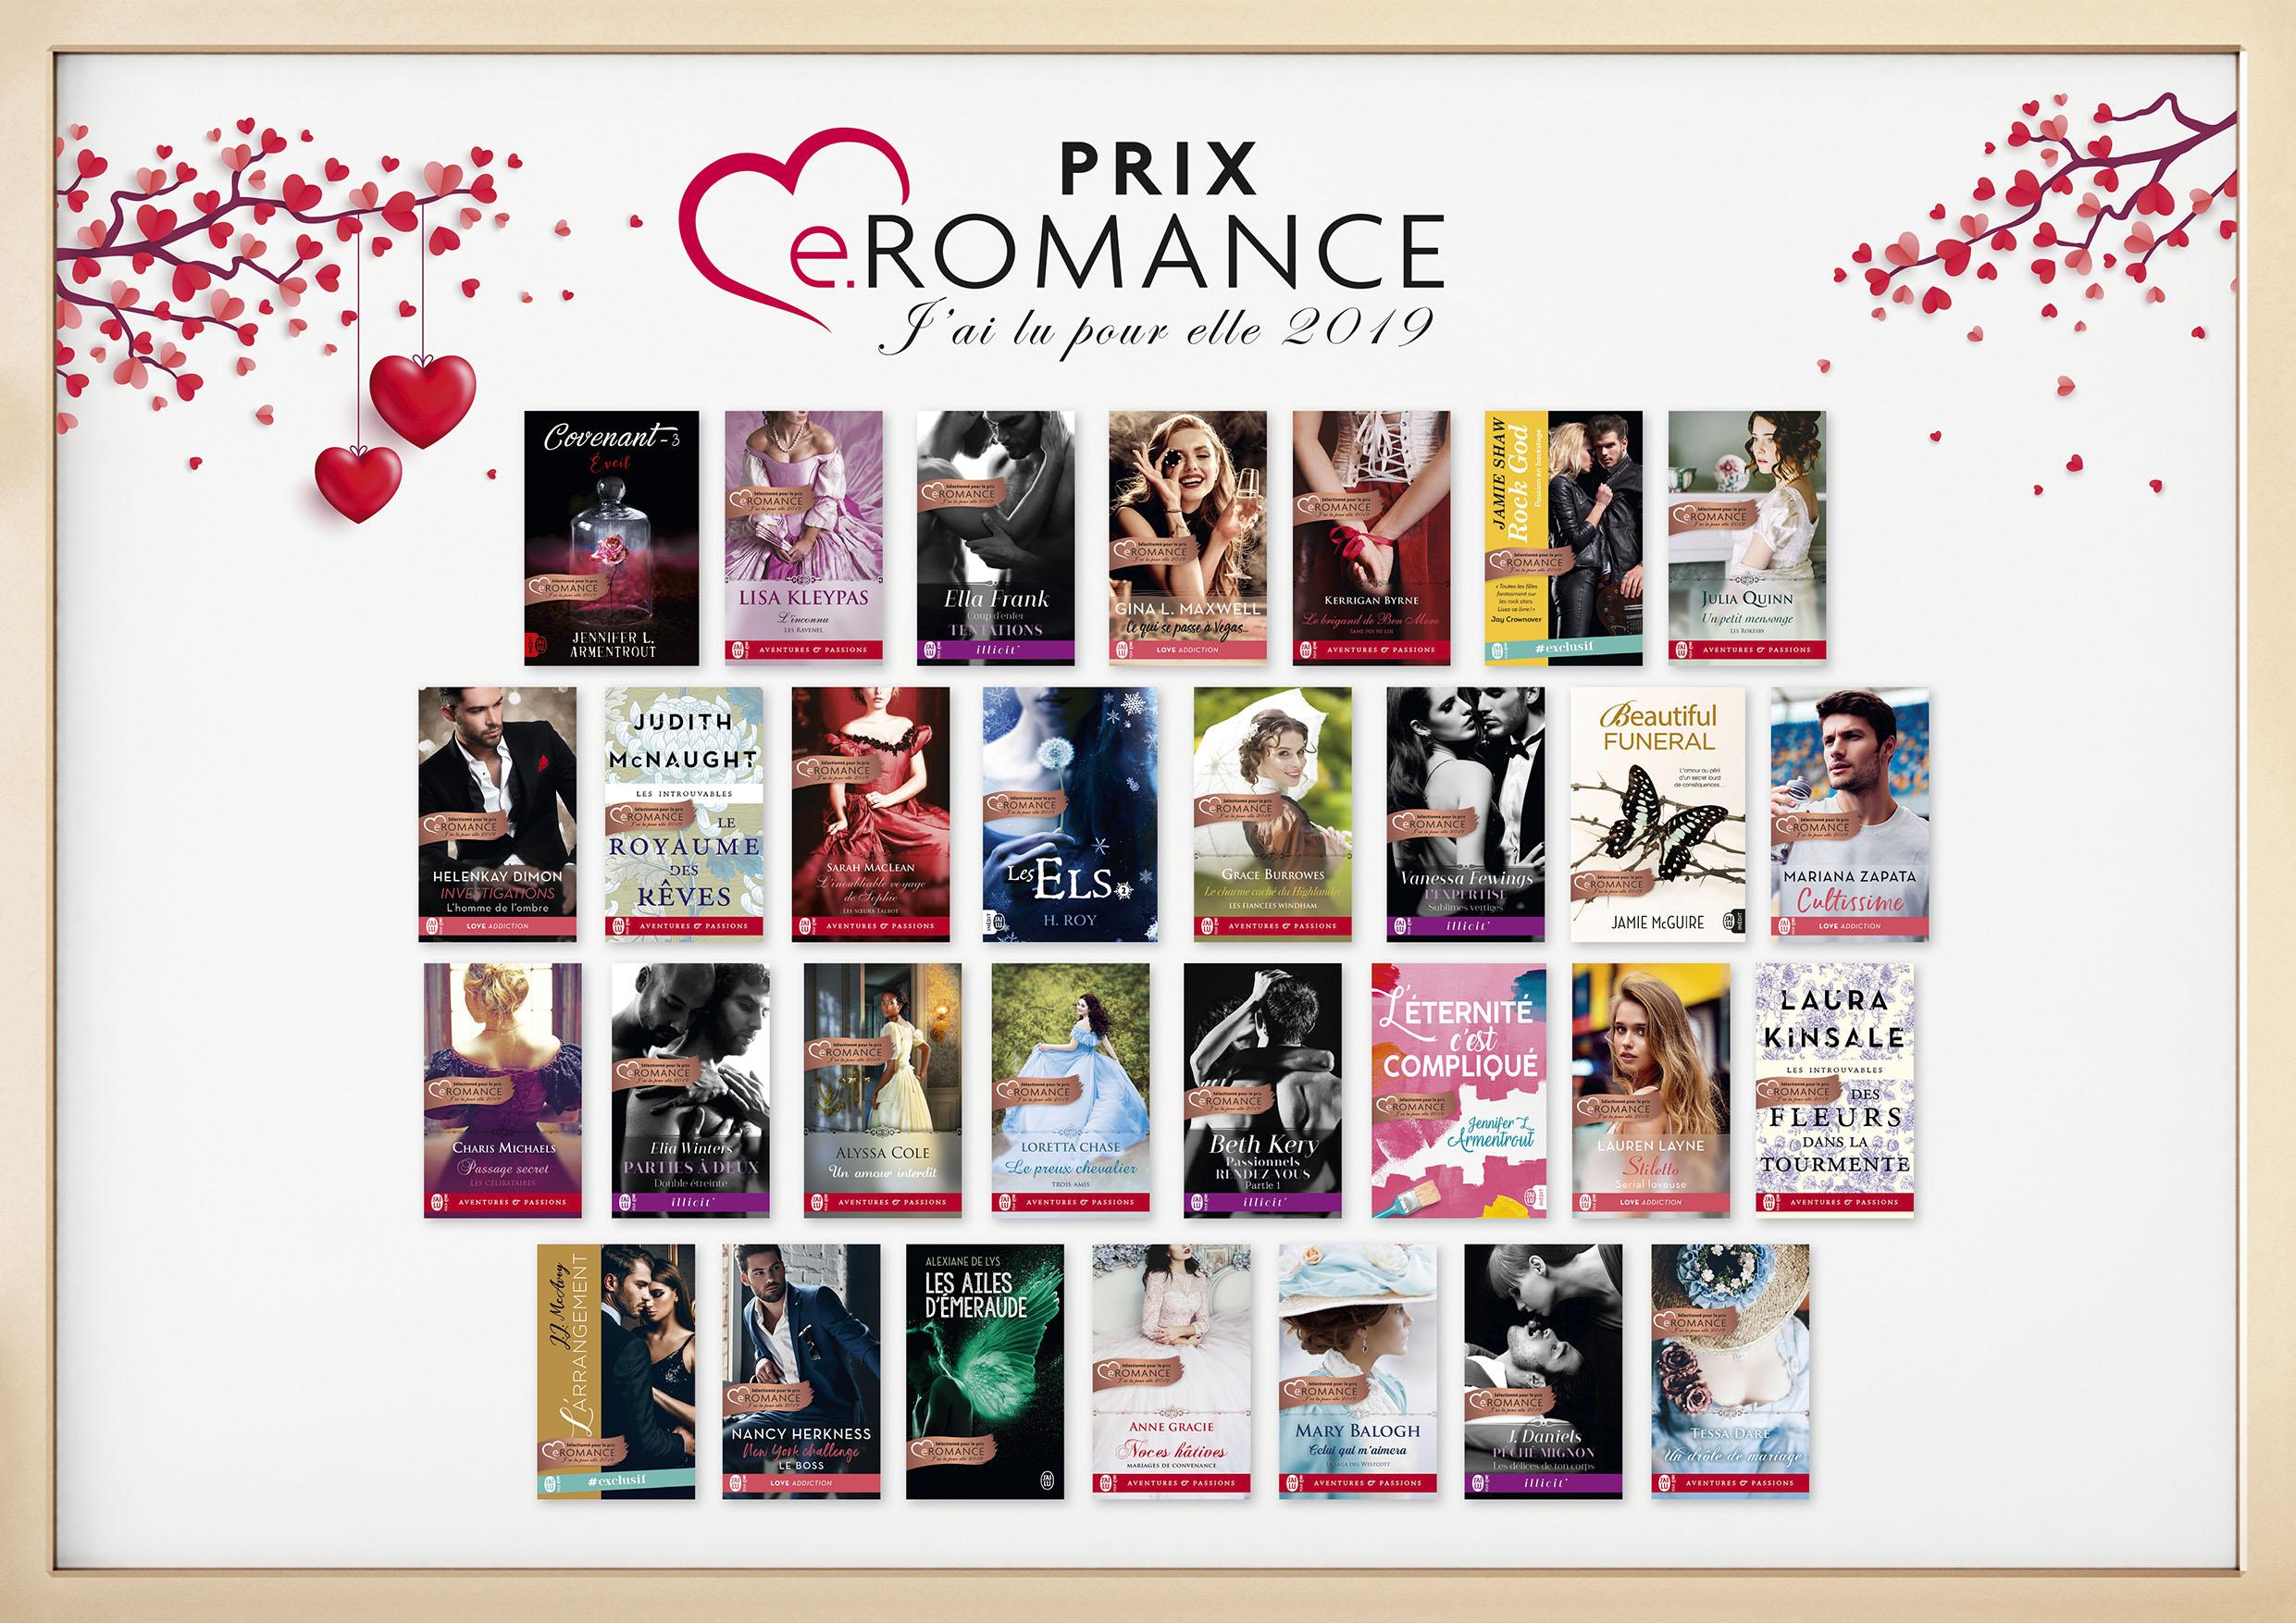 prix - Prix e.Romance J'ai Lu Pour Elle 2019 Affich10